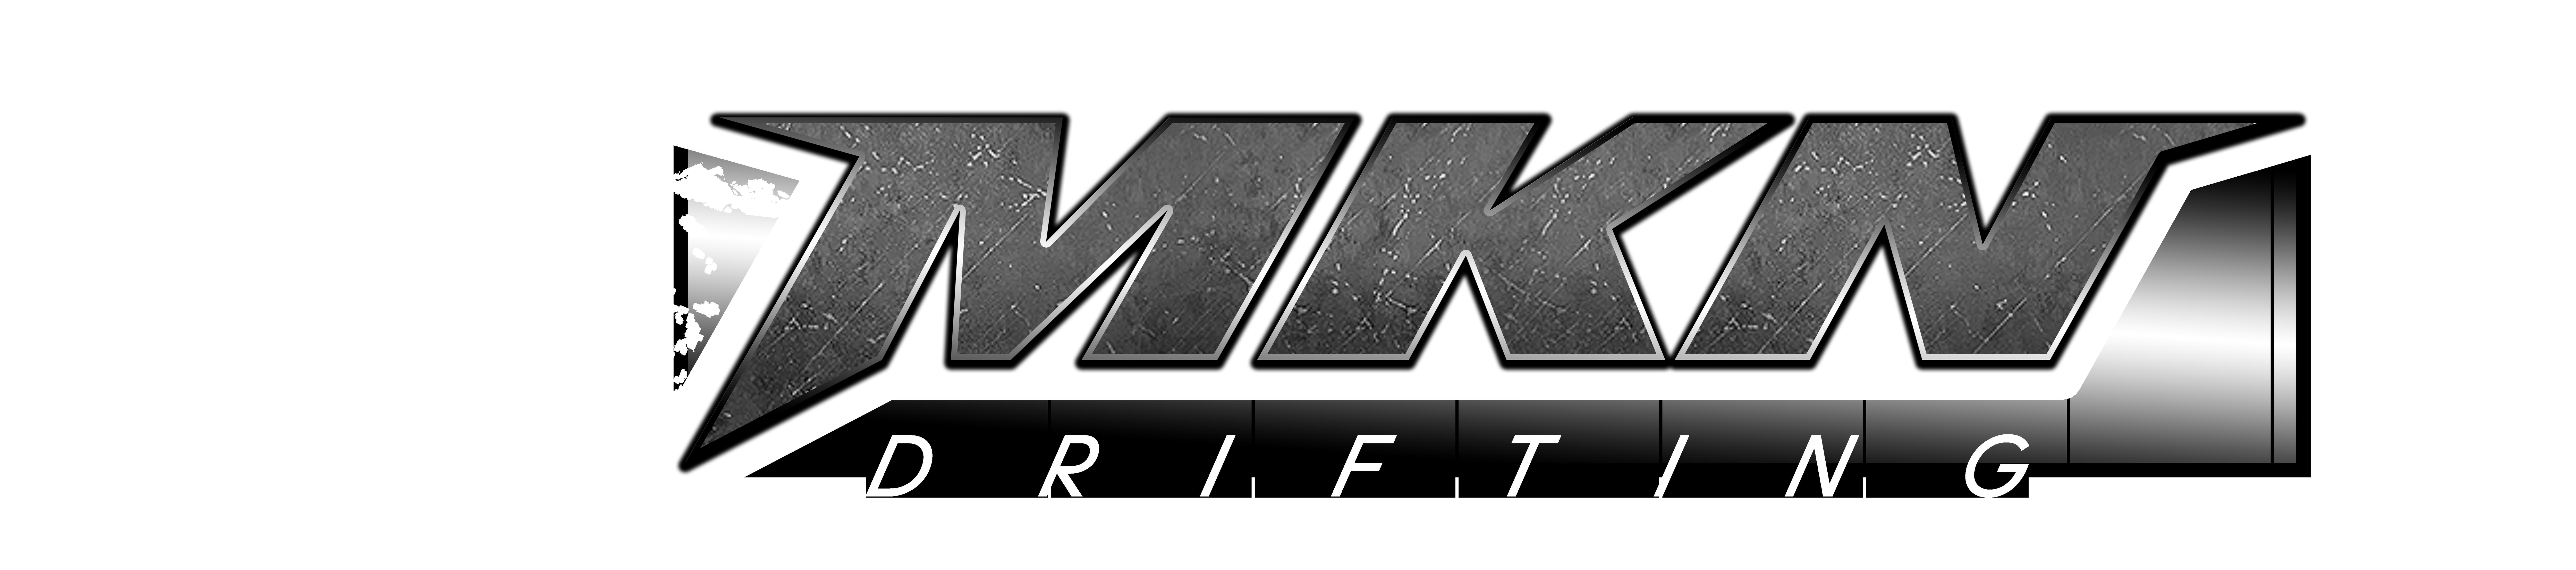 MKN Drifting